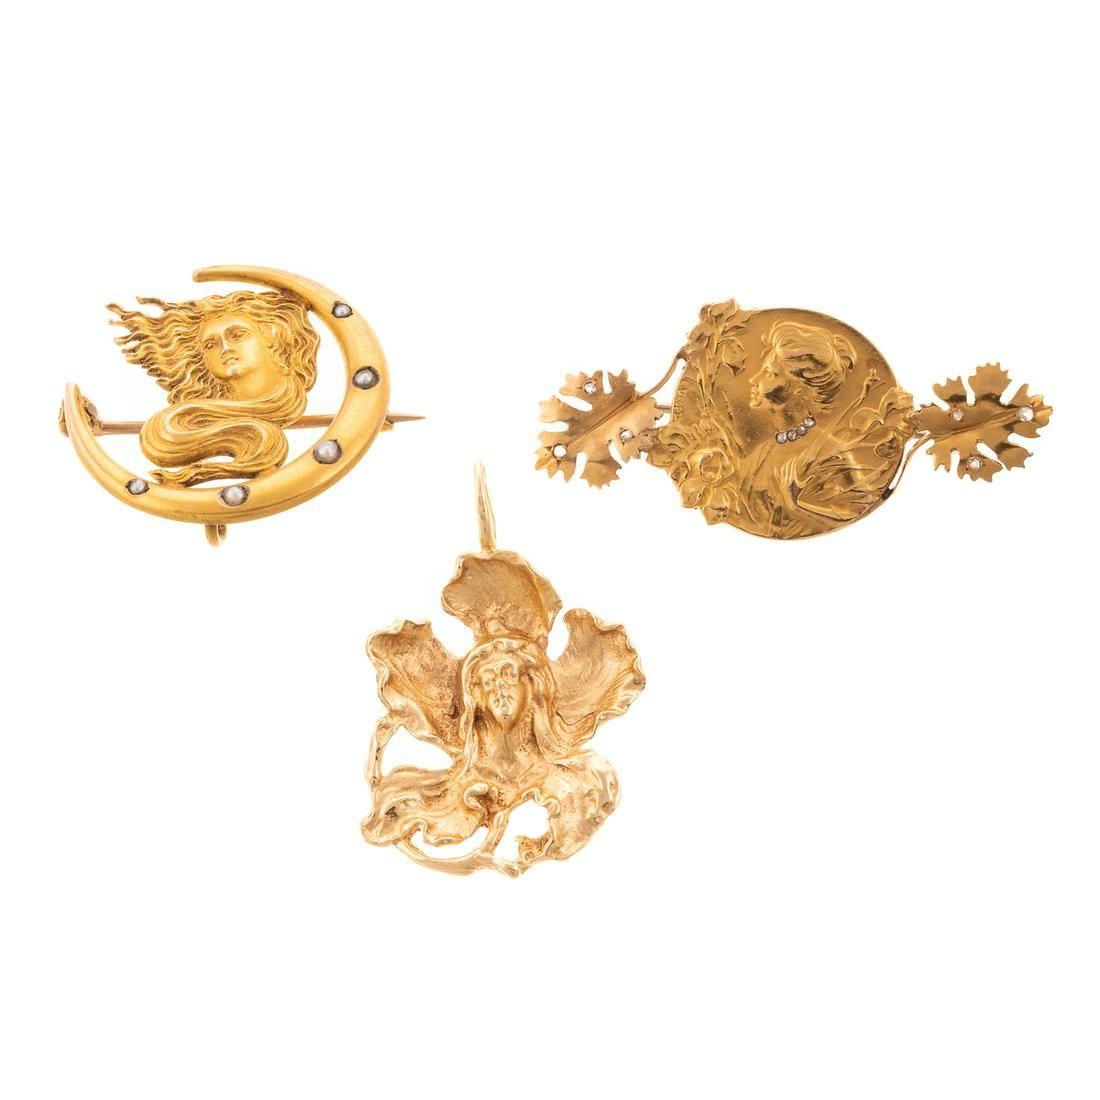 Collection of Three Art Nouveau Pieces